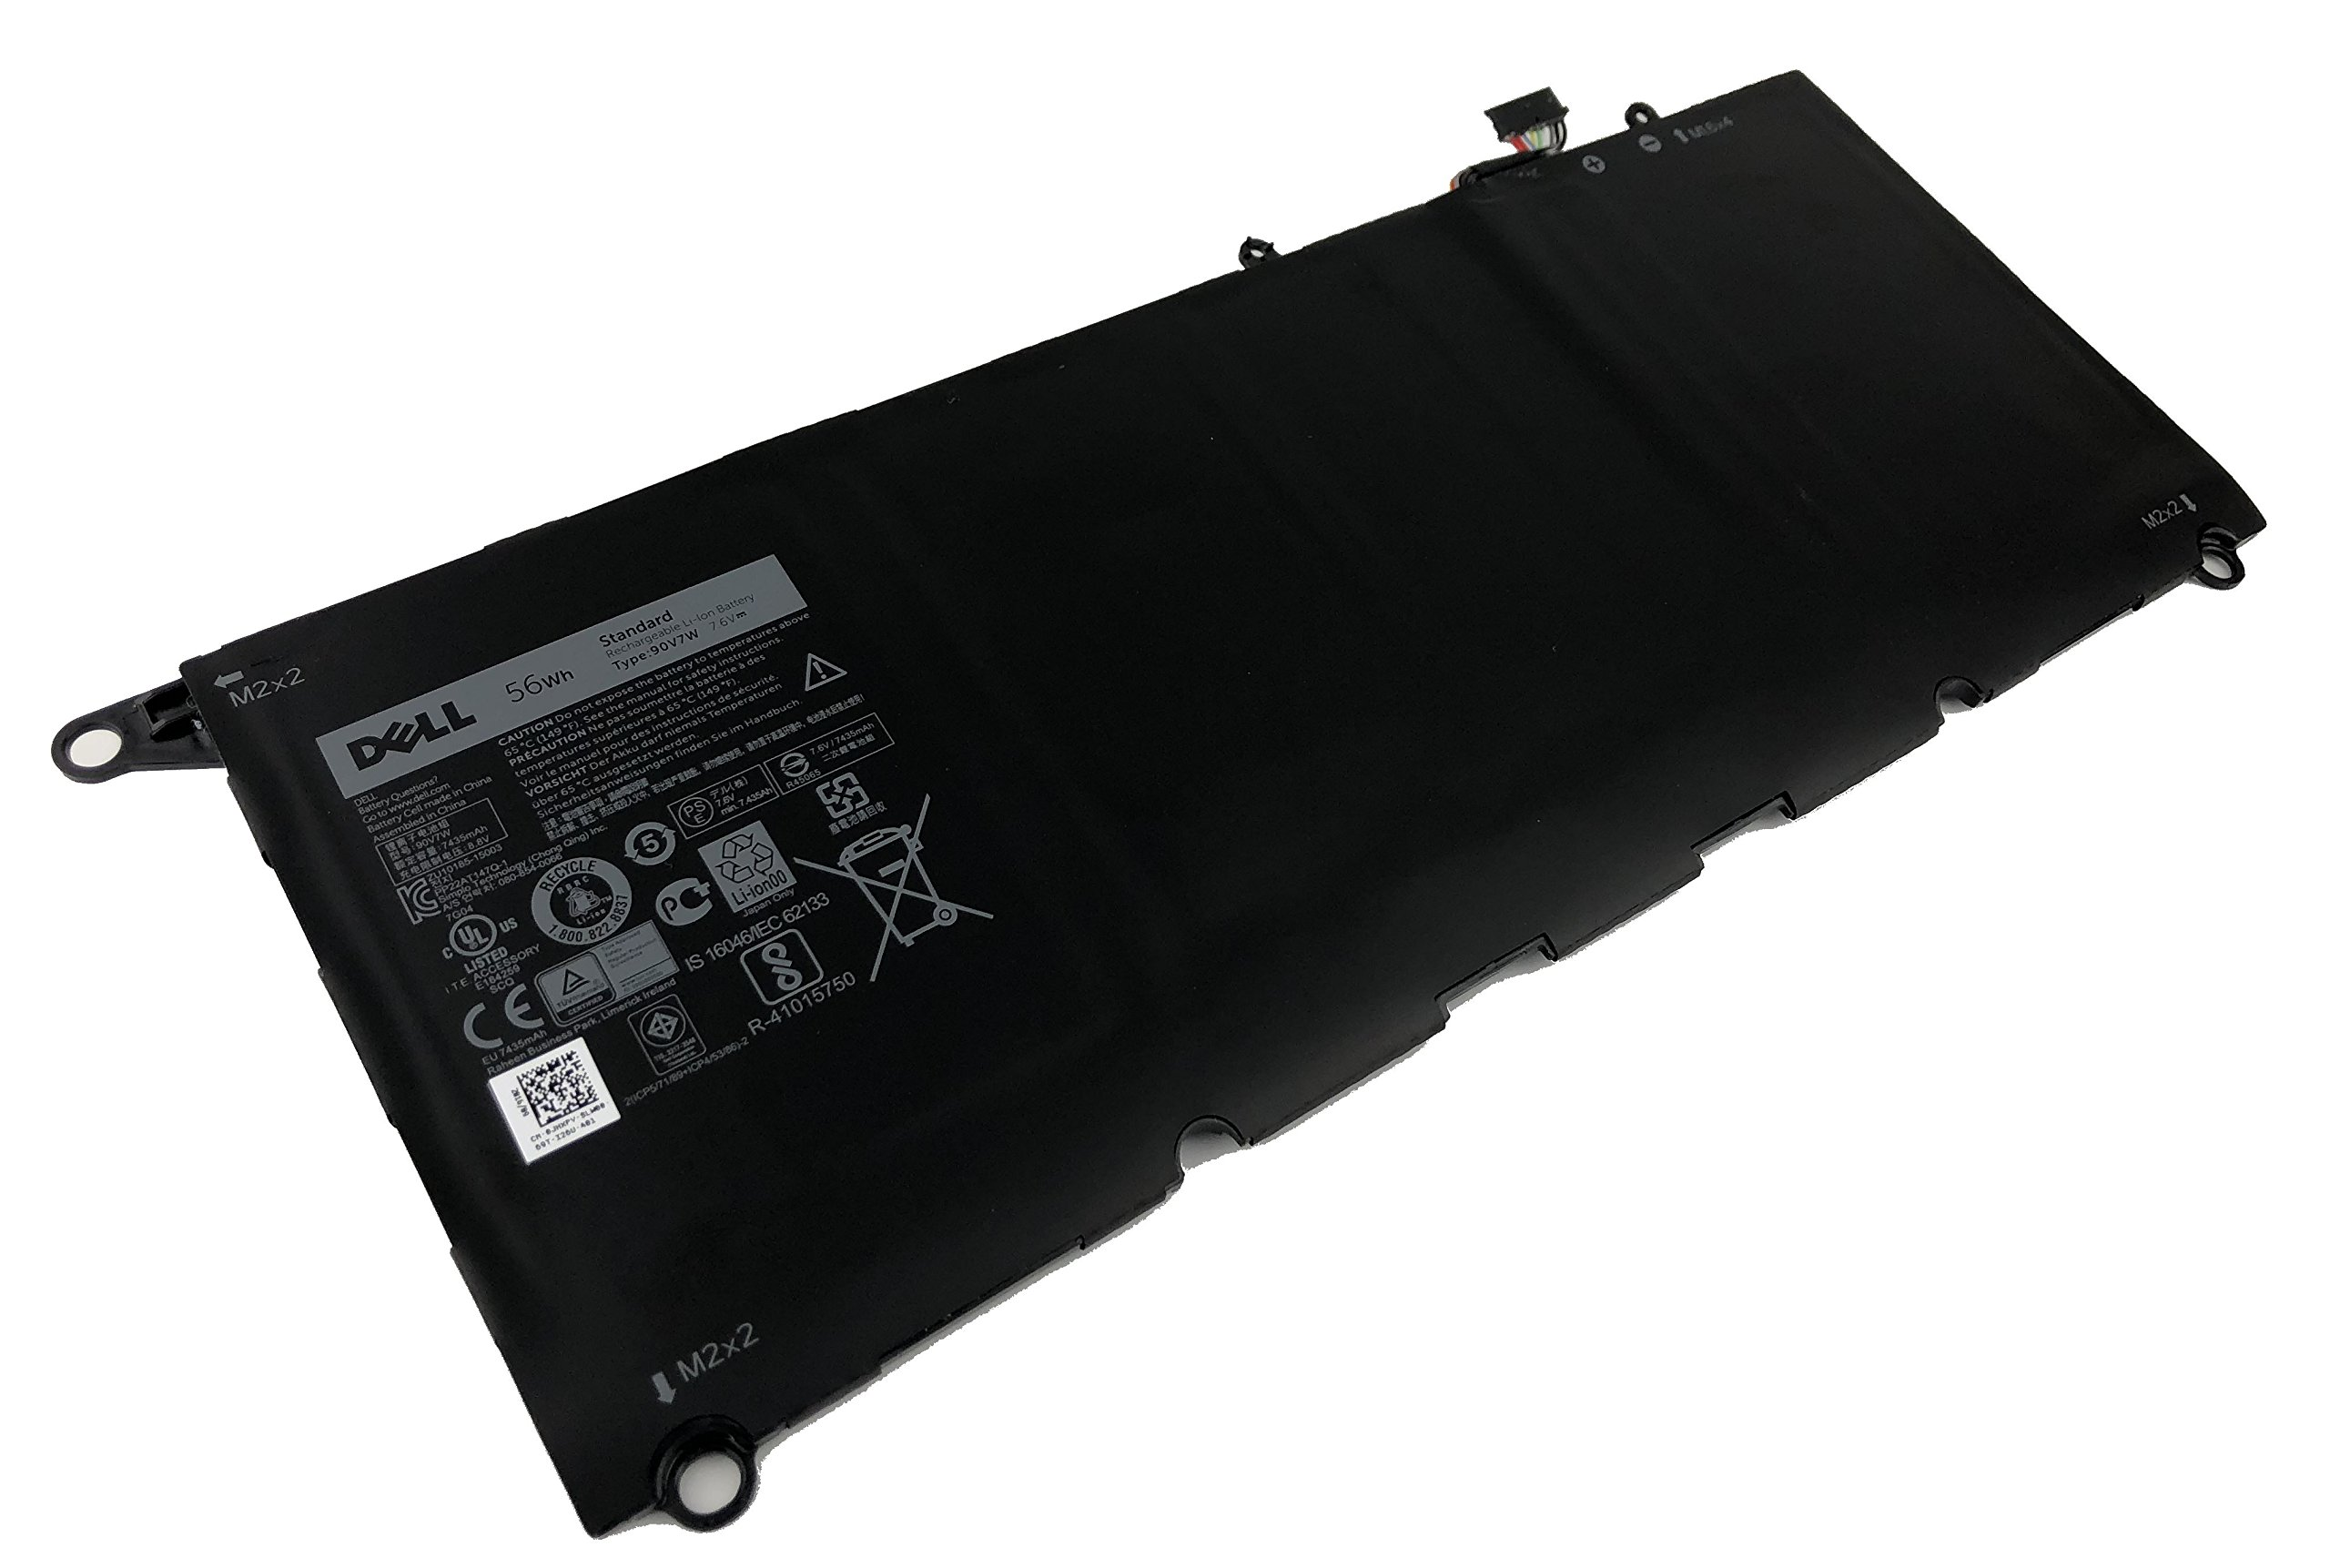 Genuine DELL XPS 13 9350 56Wh 7.6V Laptop Recharable Li-on Battery JHXPY 90V7W